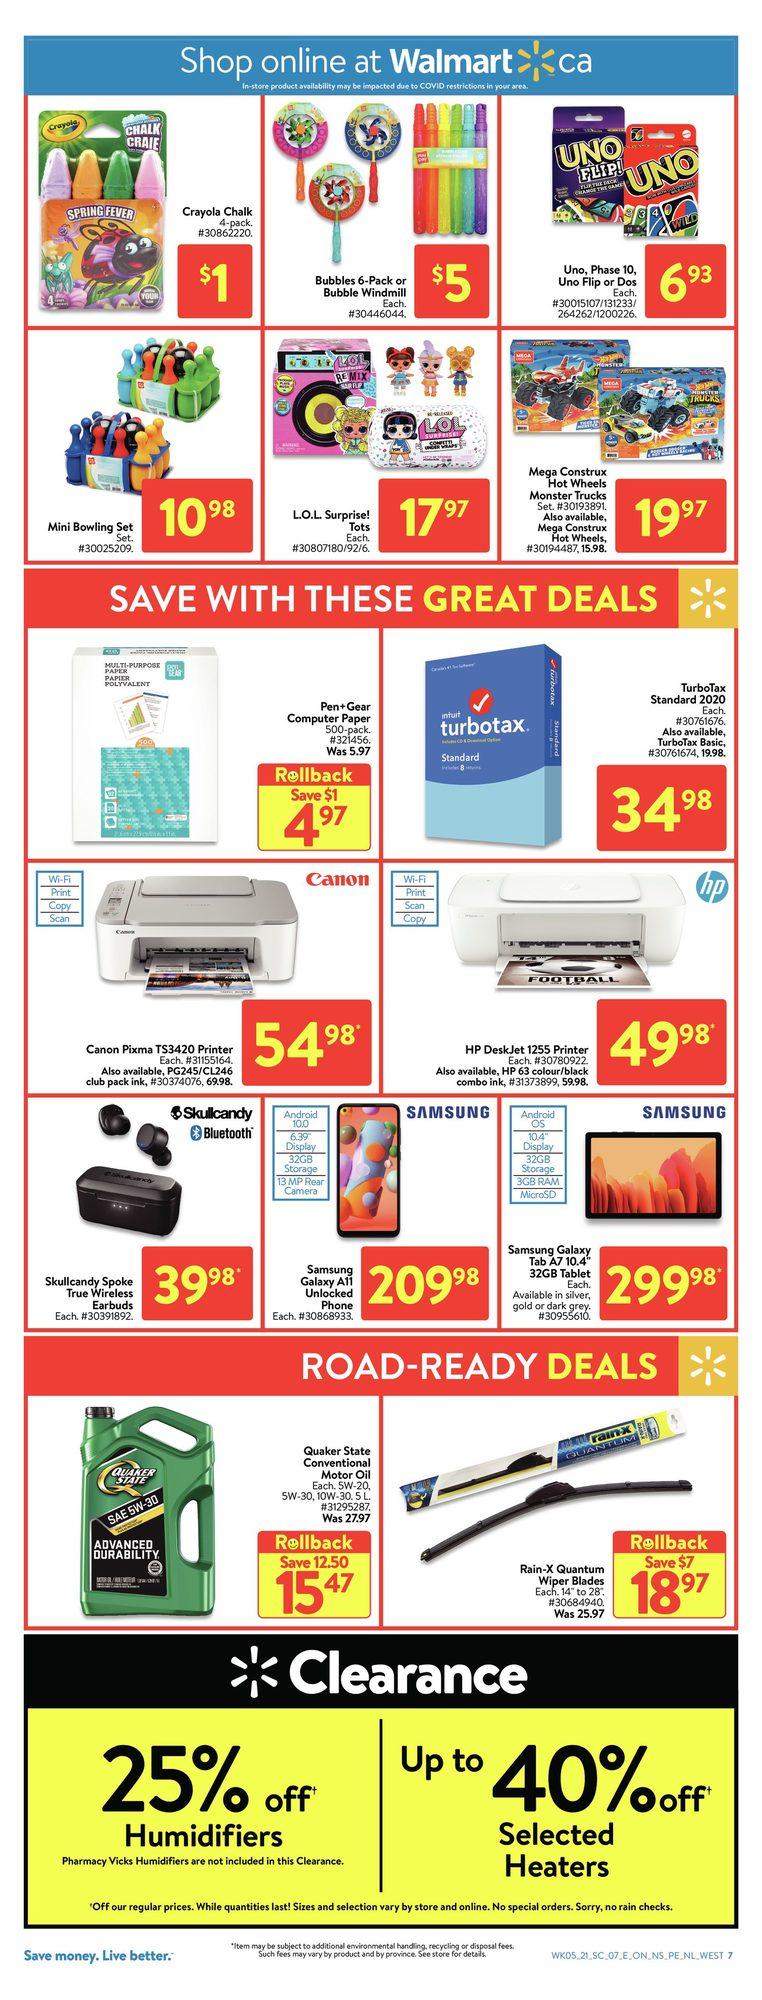 Walmart - Weekly Flyer Specials - Page 12